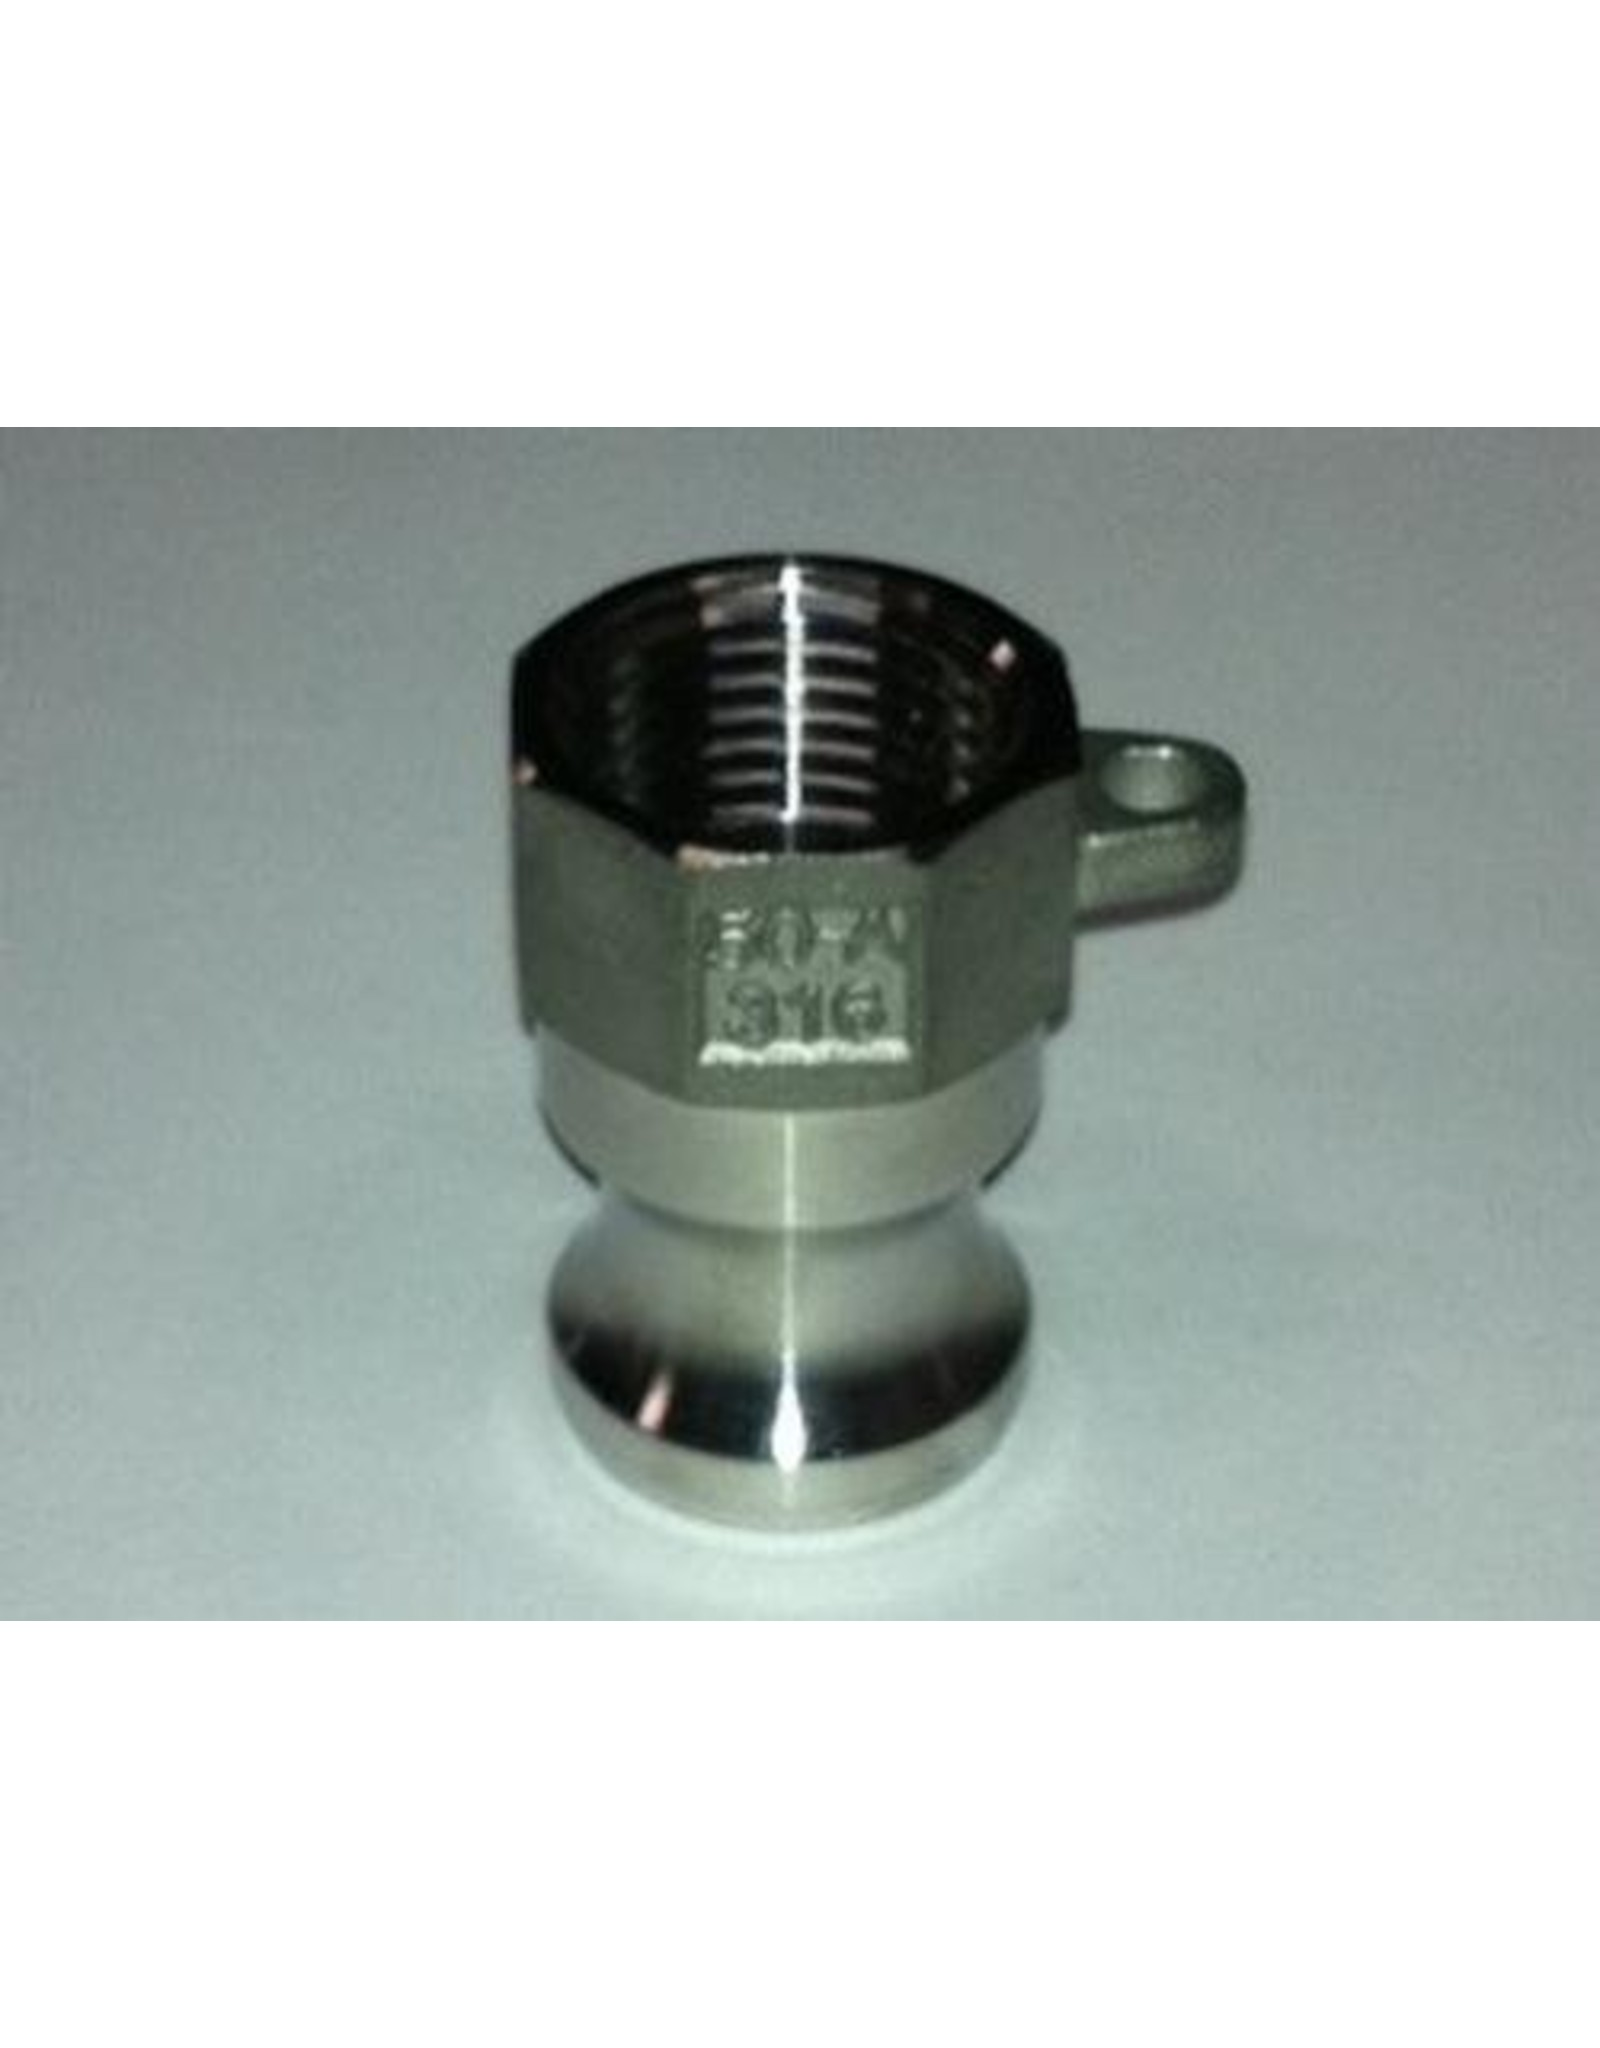 Proflow Dynamics 1/2 Type A Adapter'' Proflow Camlock Ss304